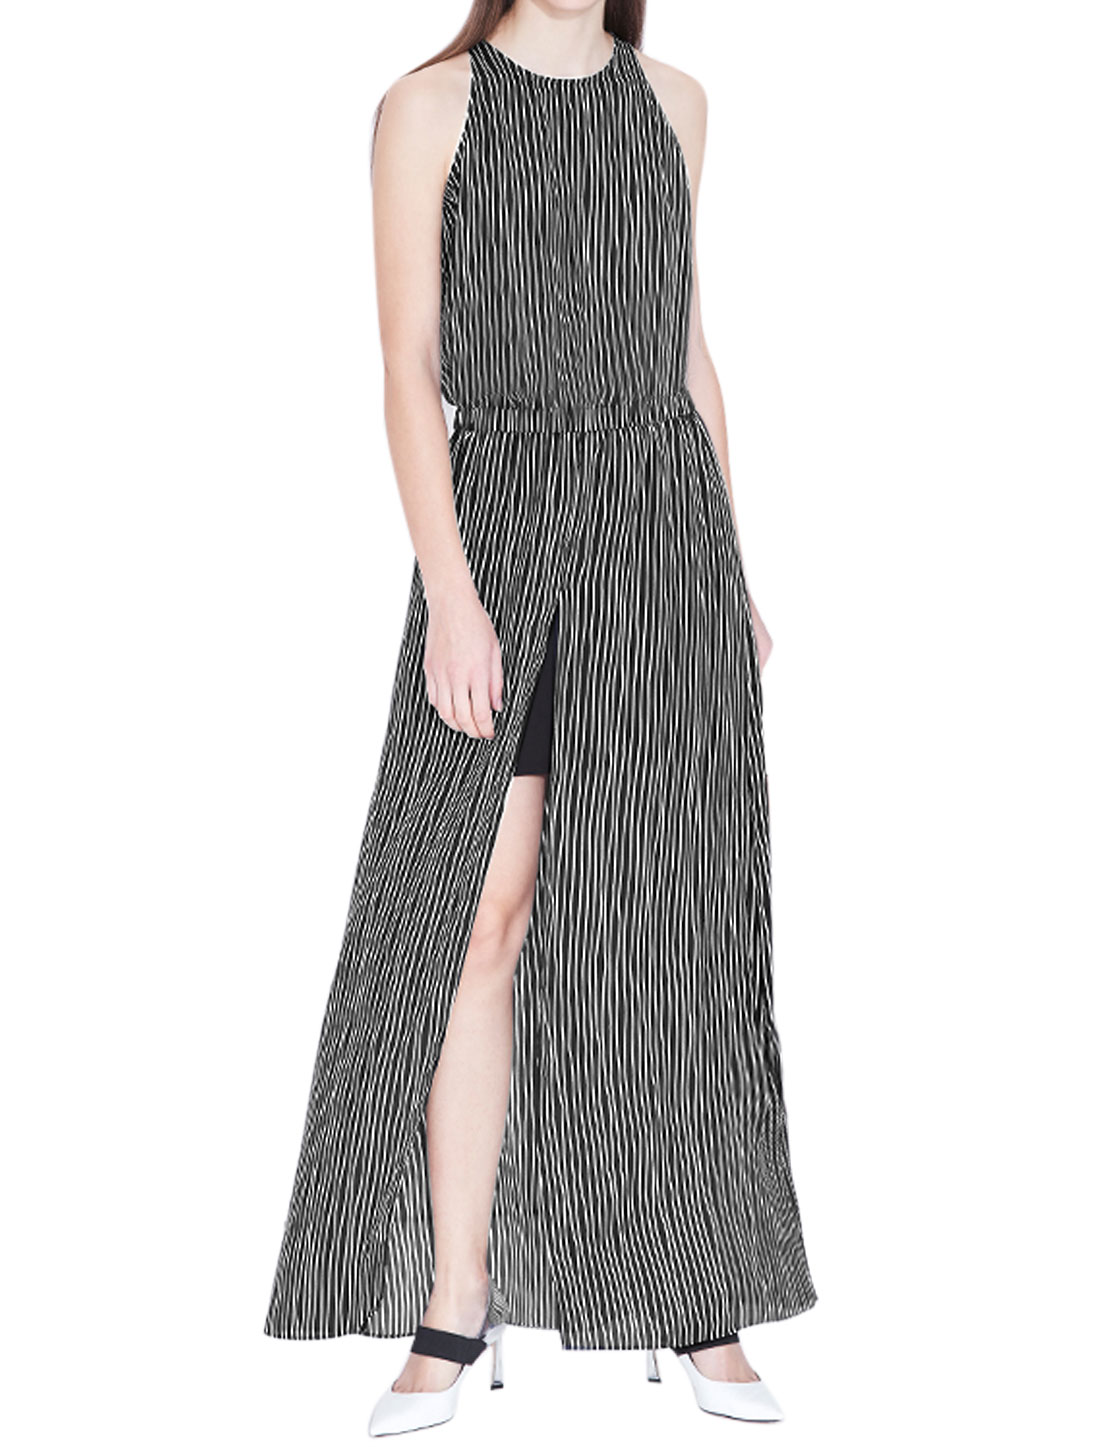 Women Split Front Elastic Waist Stripes Round Neck Maxi Dress Black S